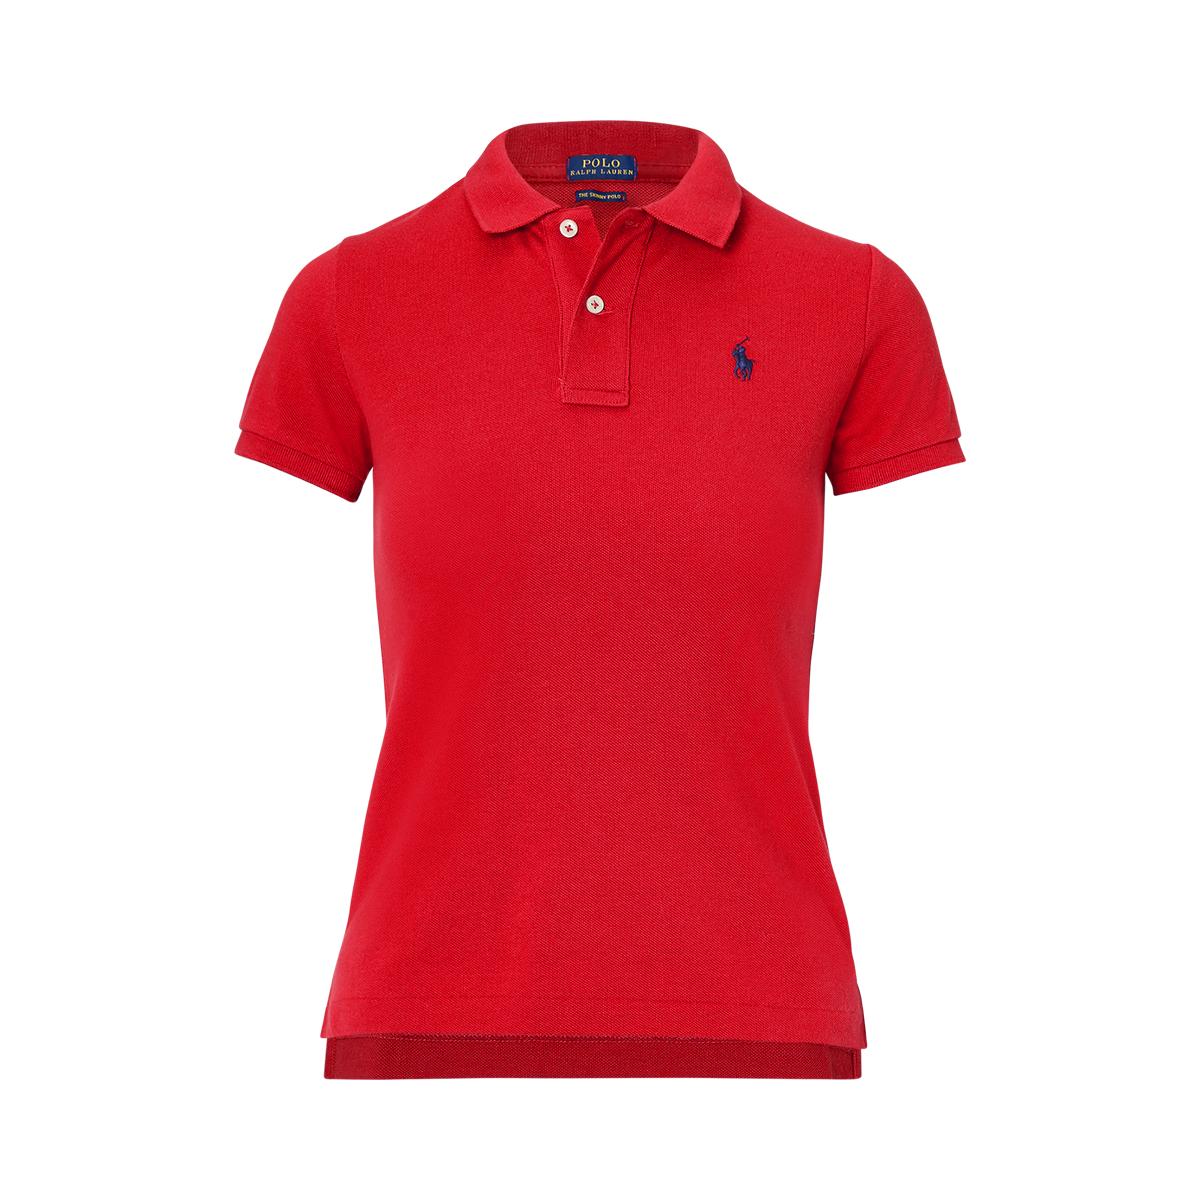 fe520a932 Skinny Fit Polo Shirt